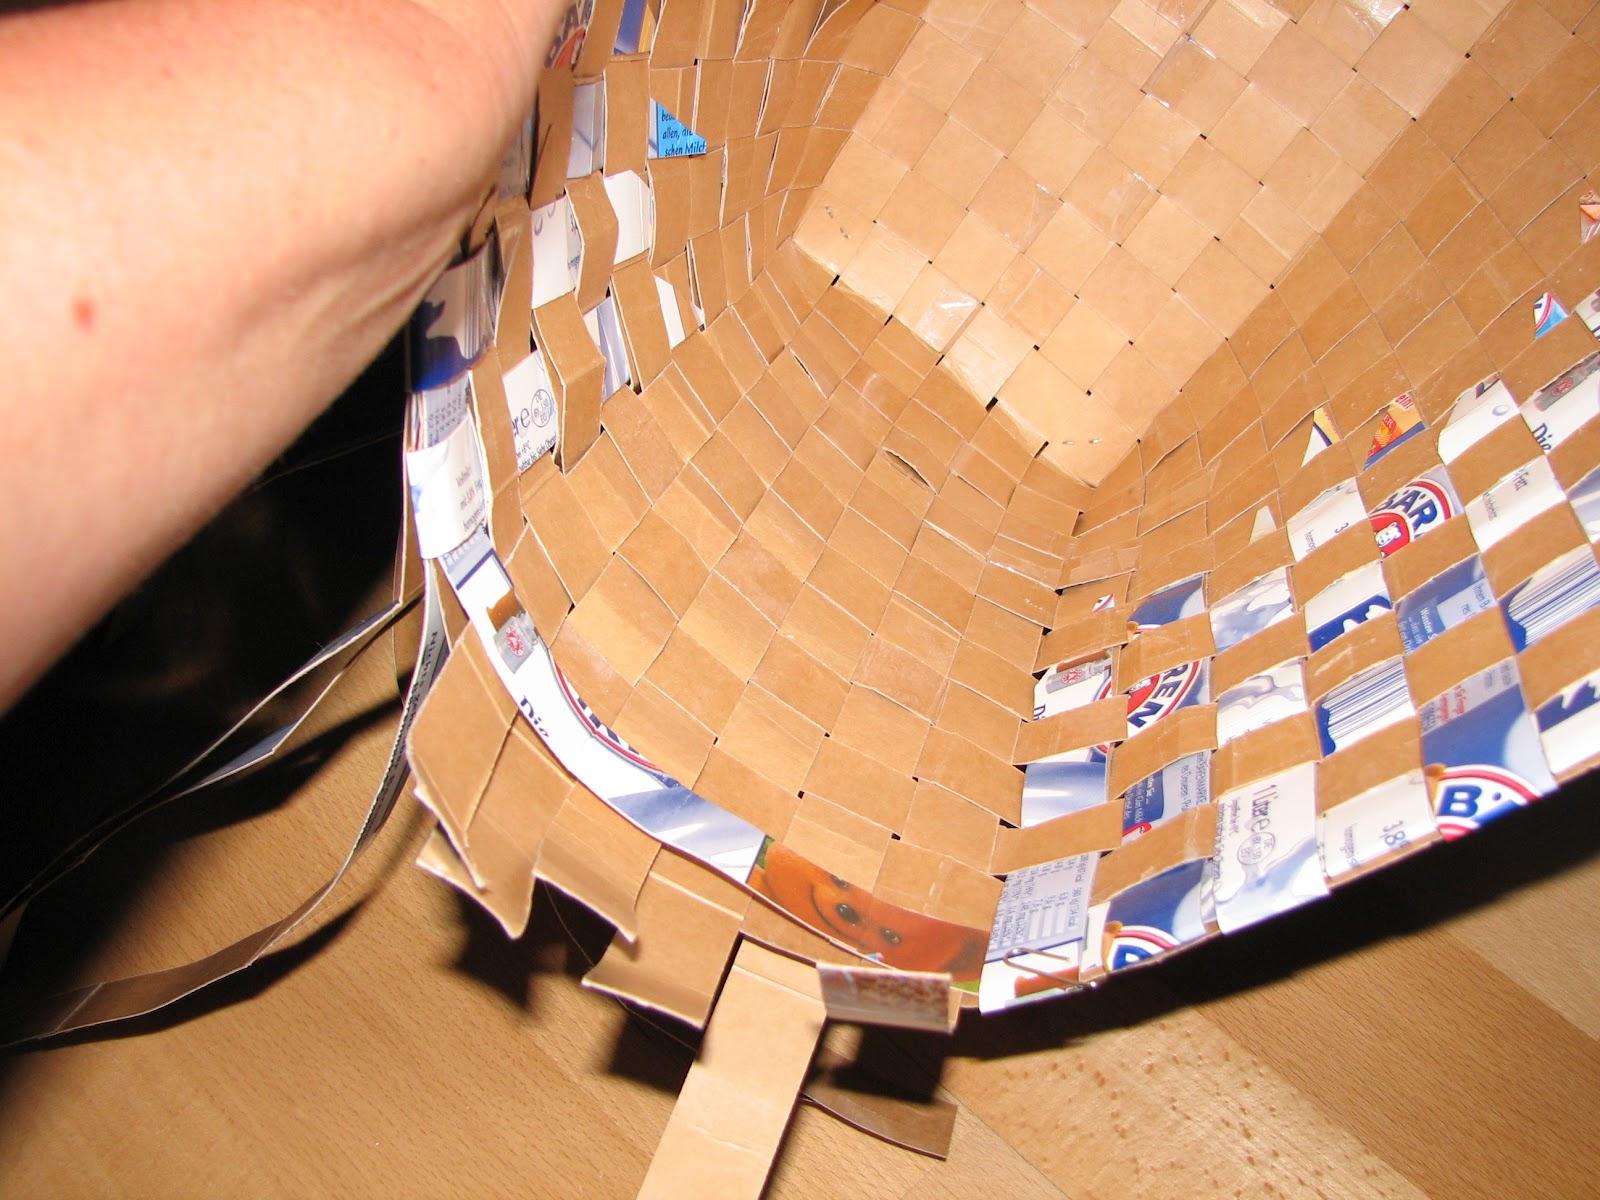 bastelnixe wannseenixe tetrapack tasche. Black Bedroom Furniture Sets. Home Design Ideas